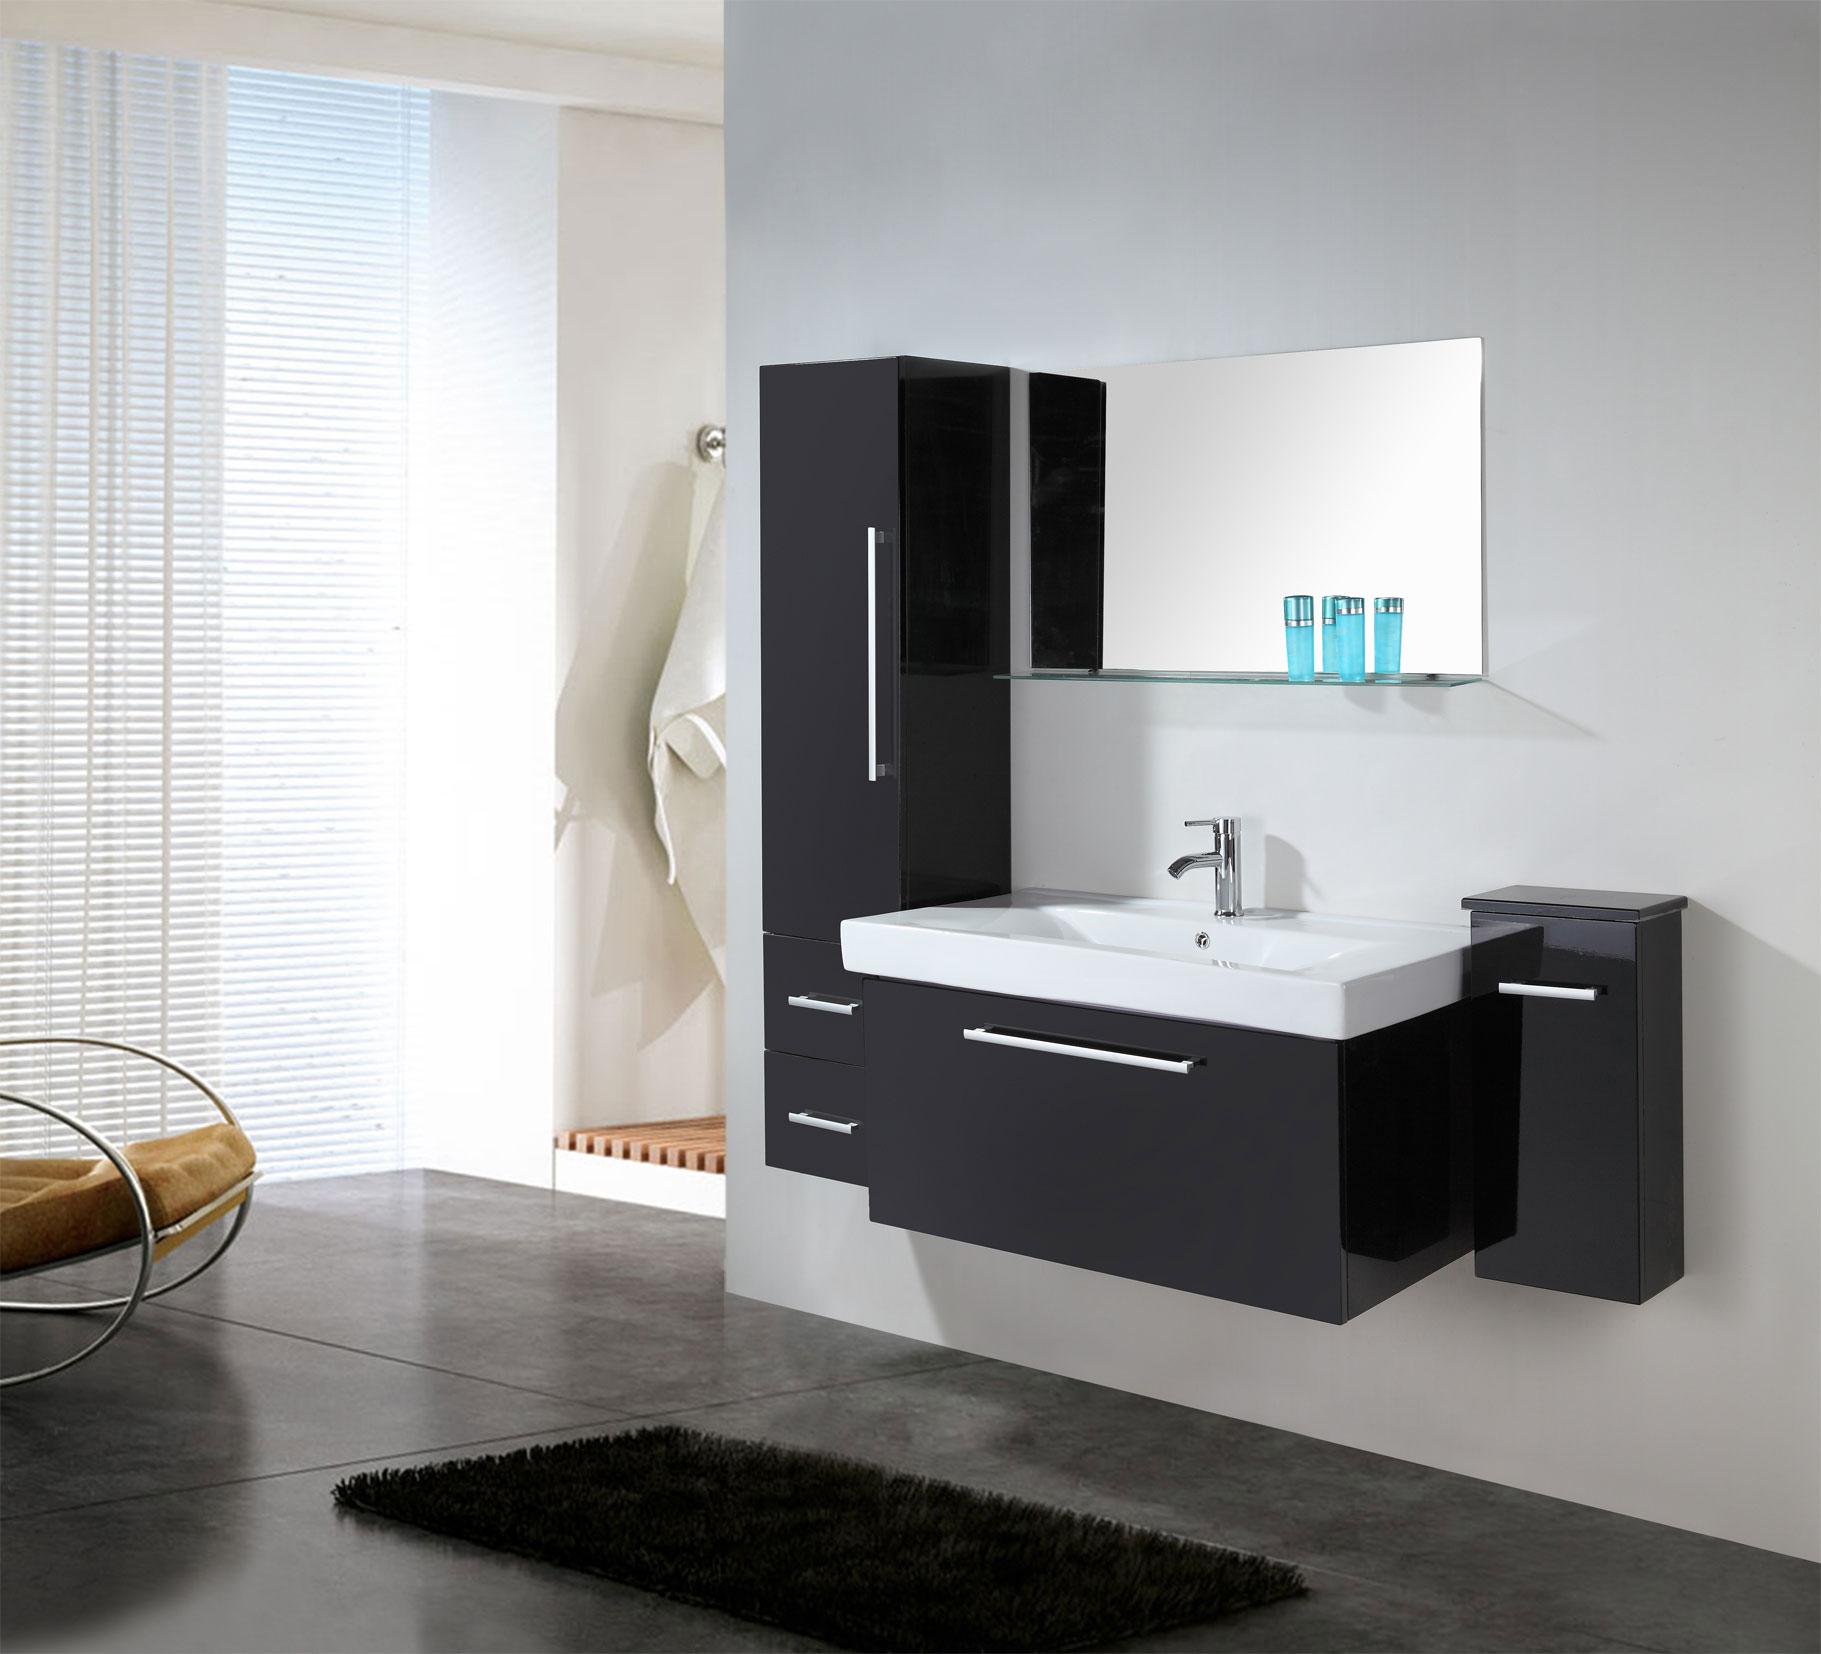 Mobile bagno arredo bagno completo easy lavabo rubinetti - Arredo bagno ebay ...